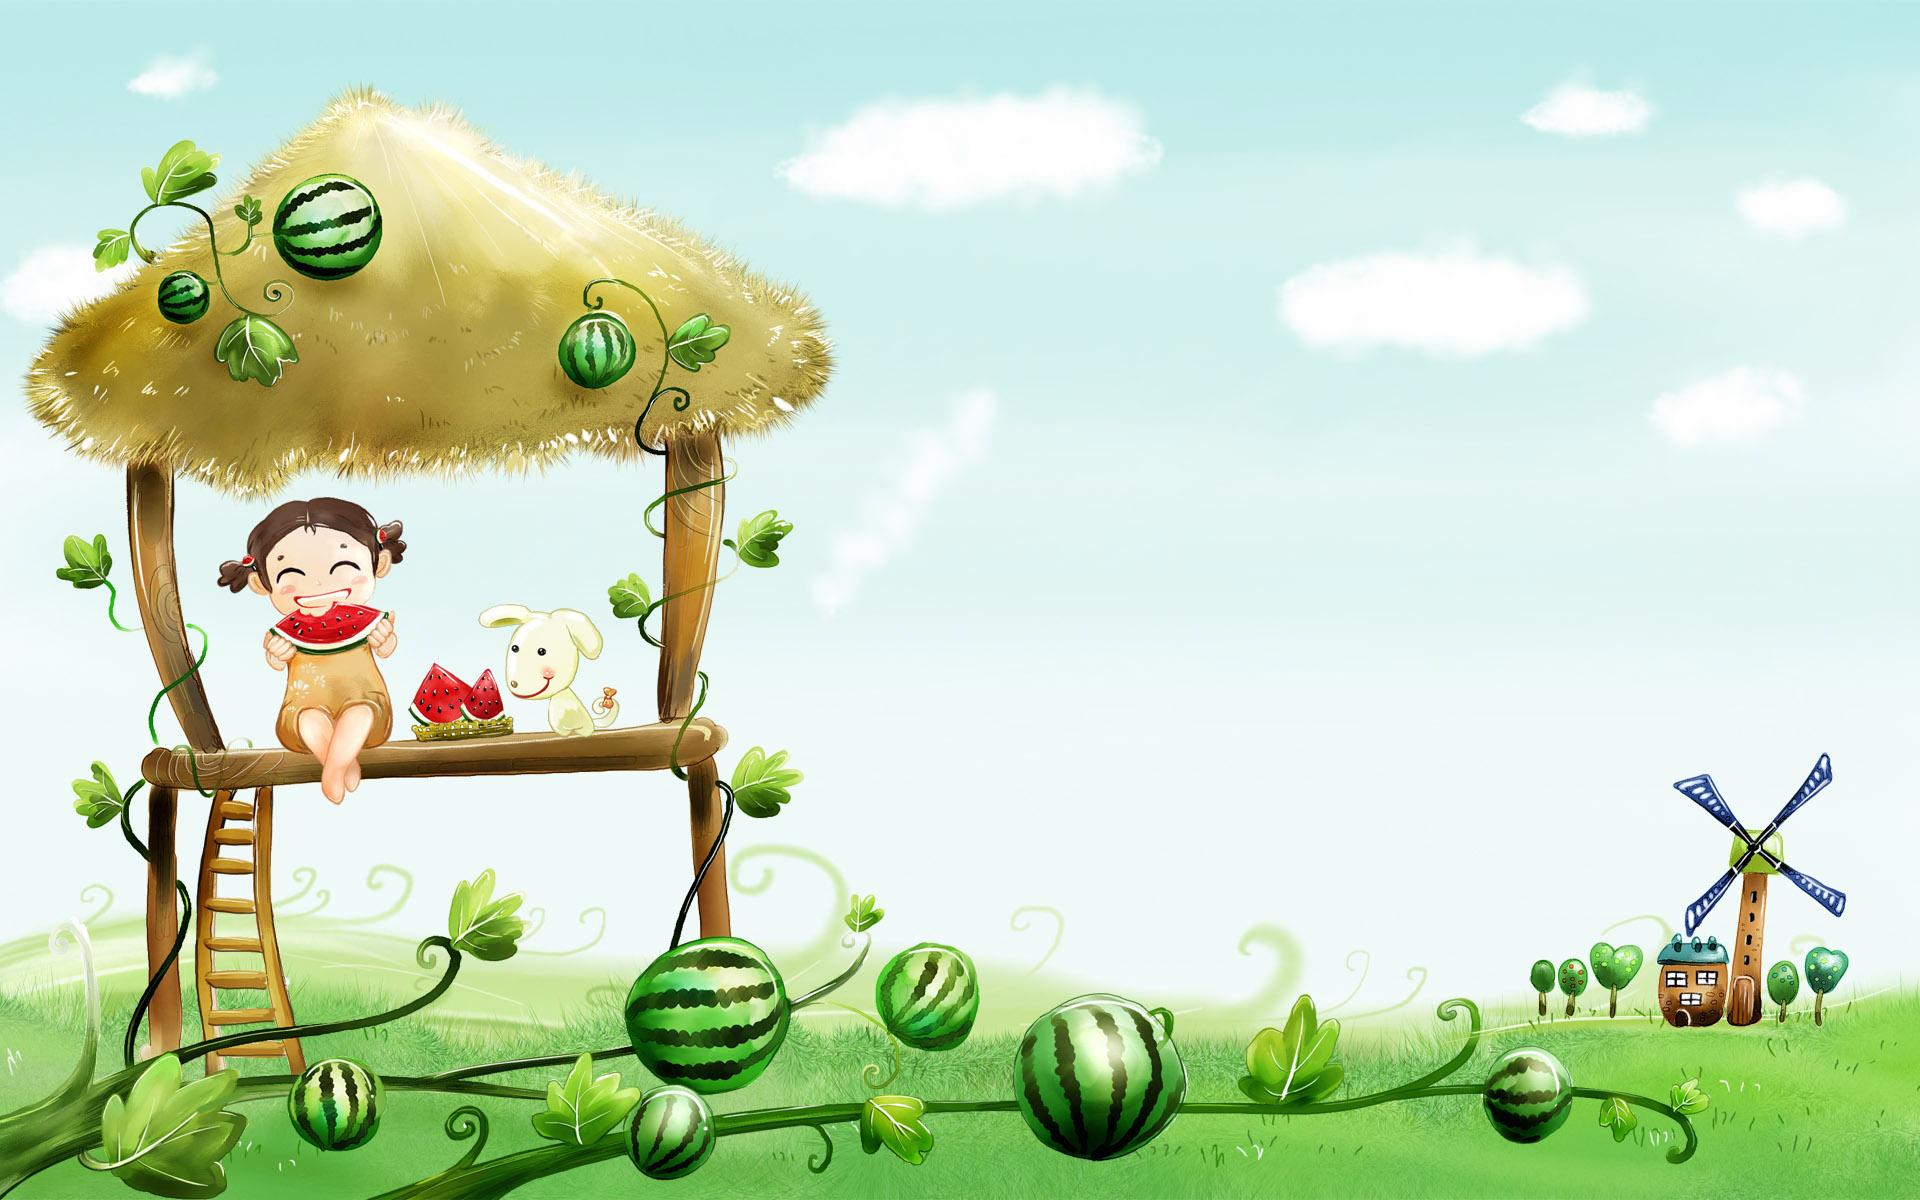 Wallpaper Desktop Cartoon Cute Download HD Wallpapers 1920x1200